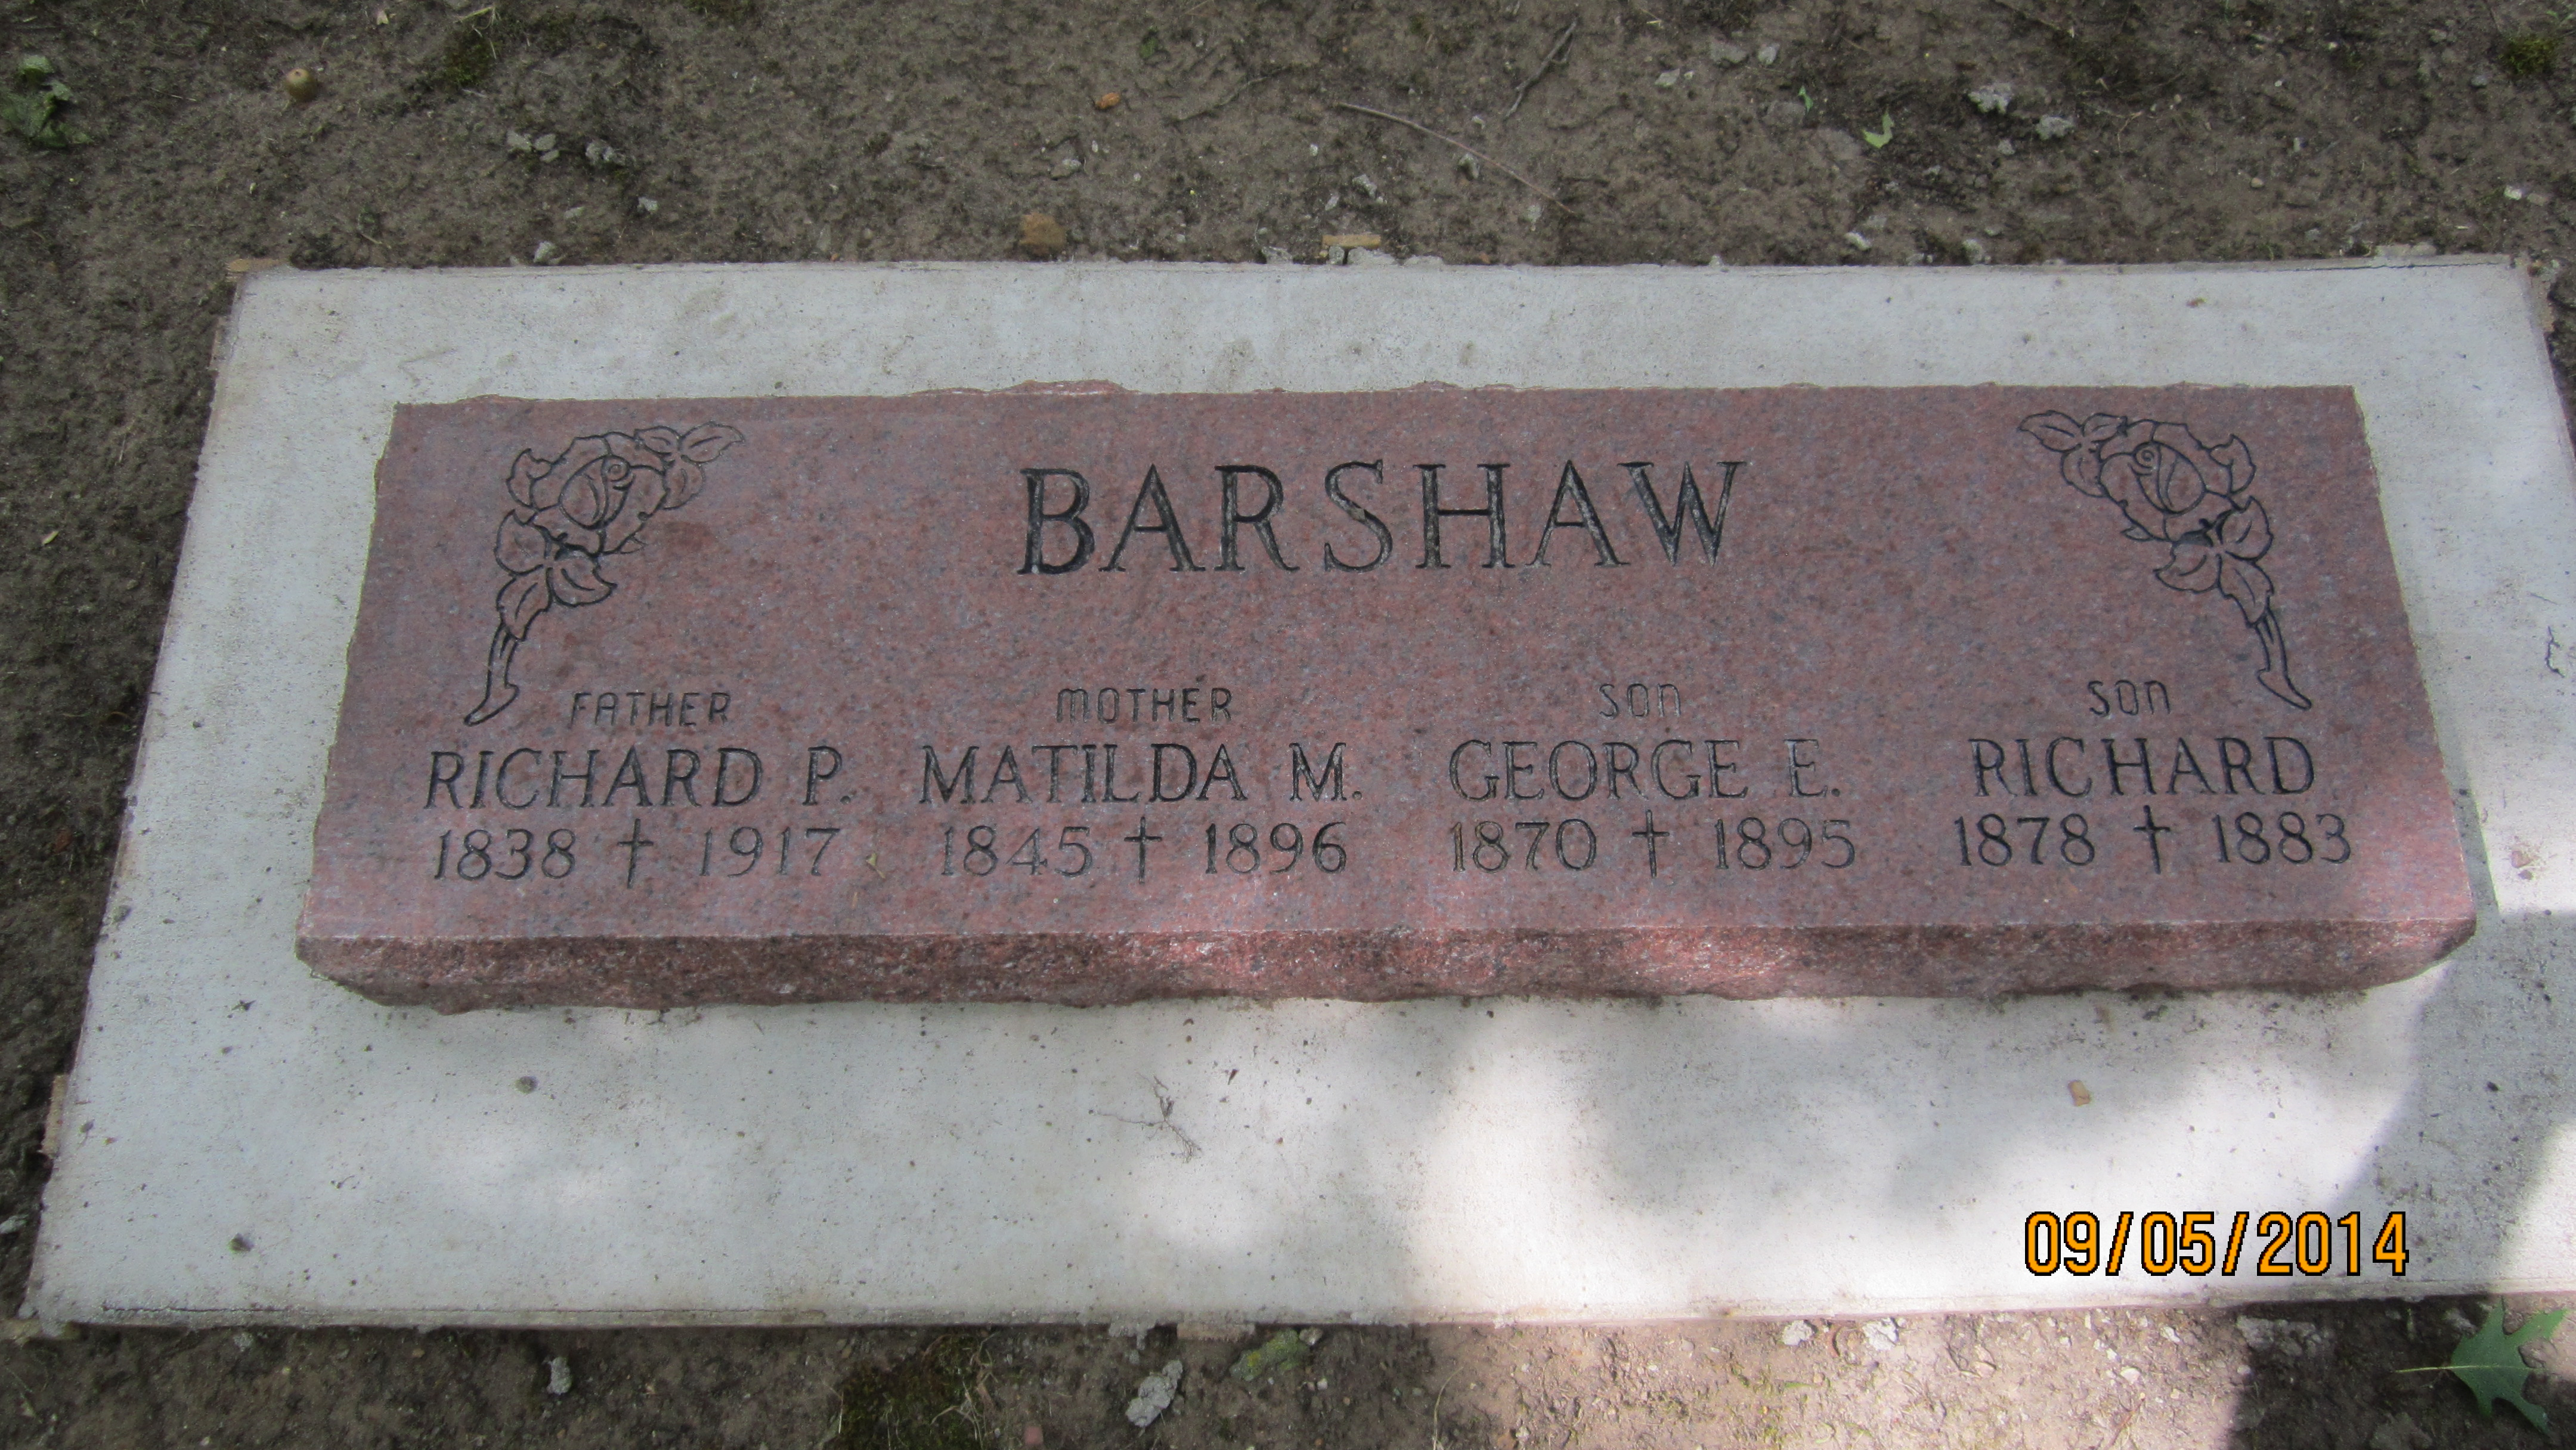 Richard Peter Bergeron Barshaw